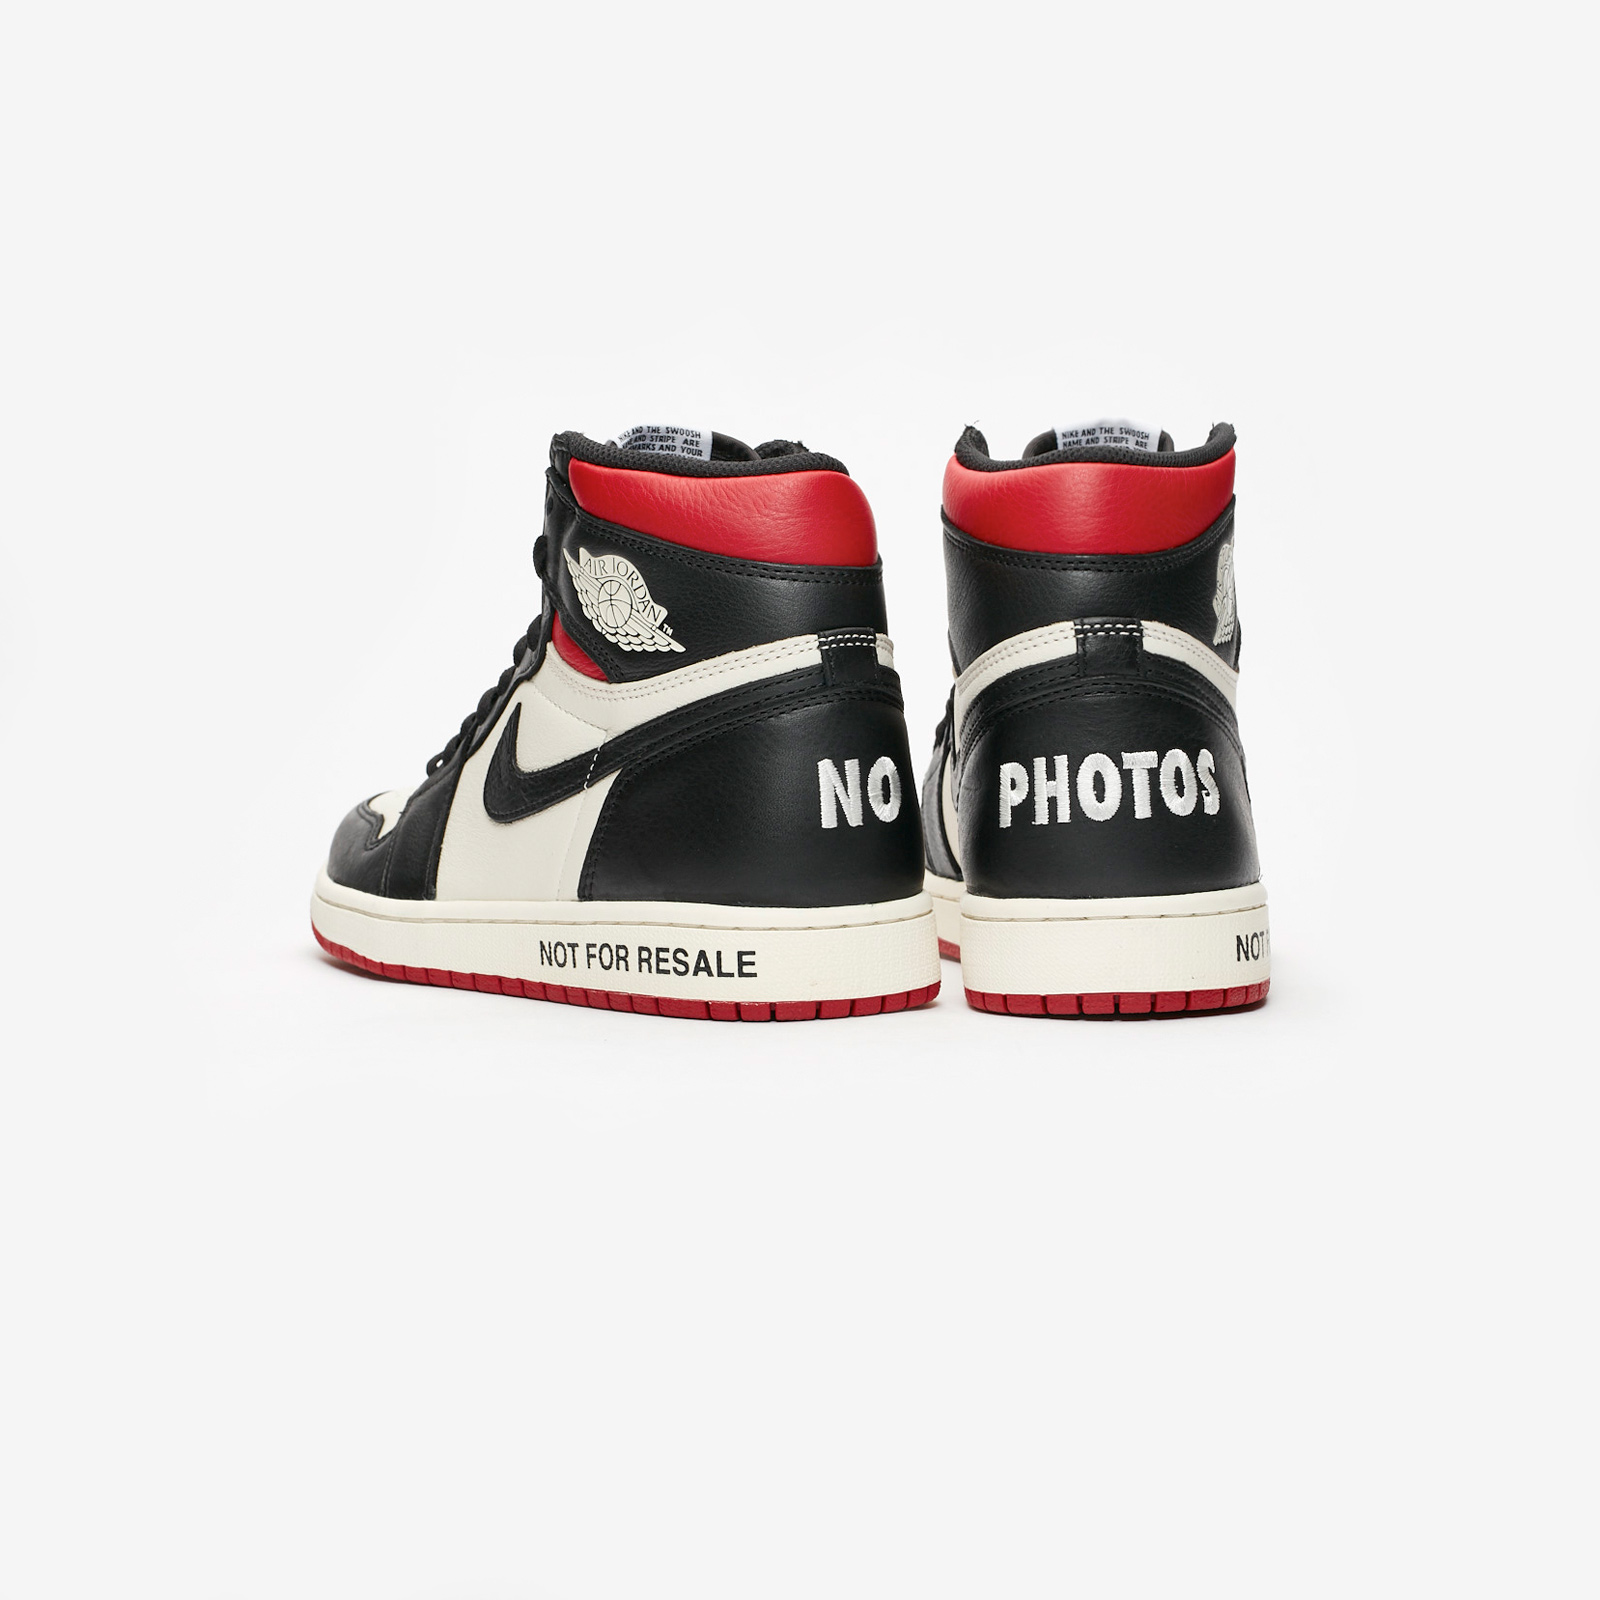 3bca321eb24607 Jordan Brand Air Jordan 1 Retro High NRG - 861428-106 - Sneakersnstuff